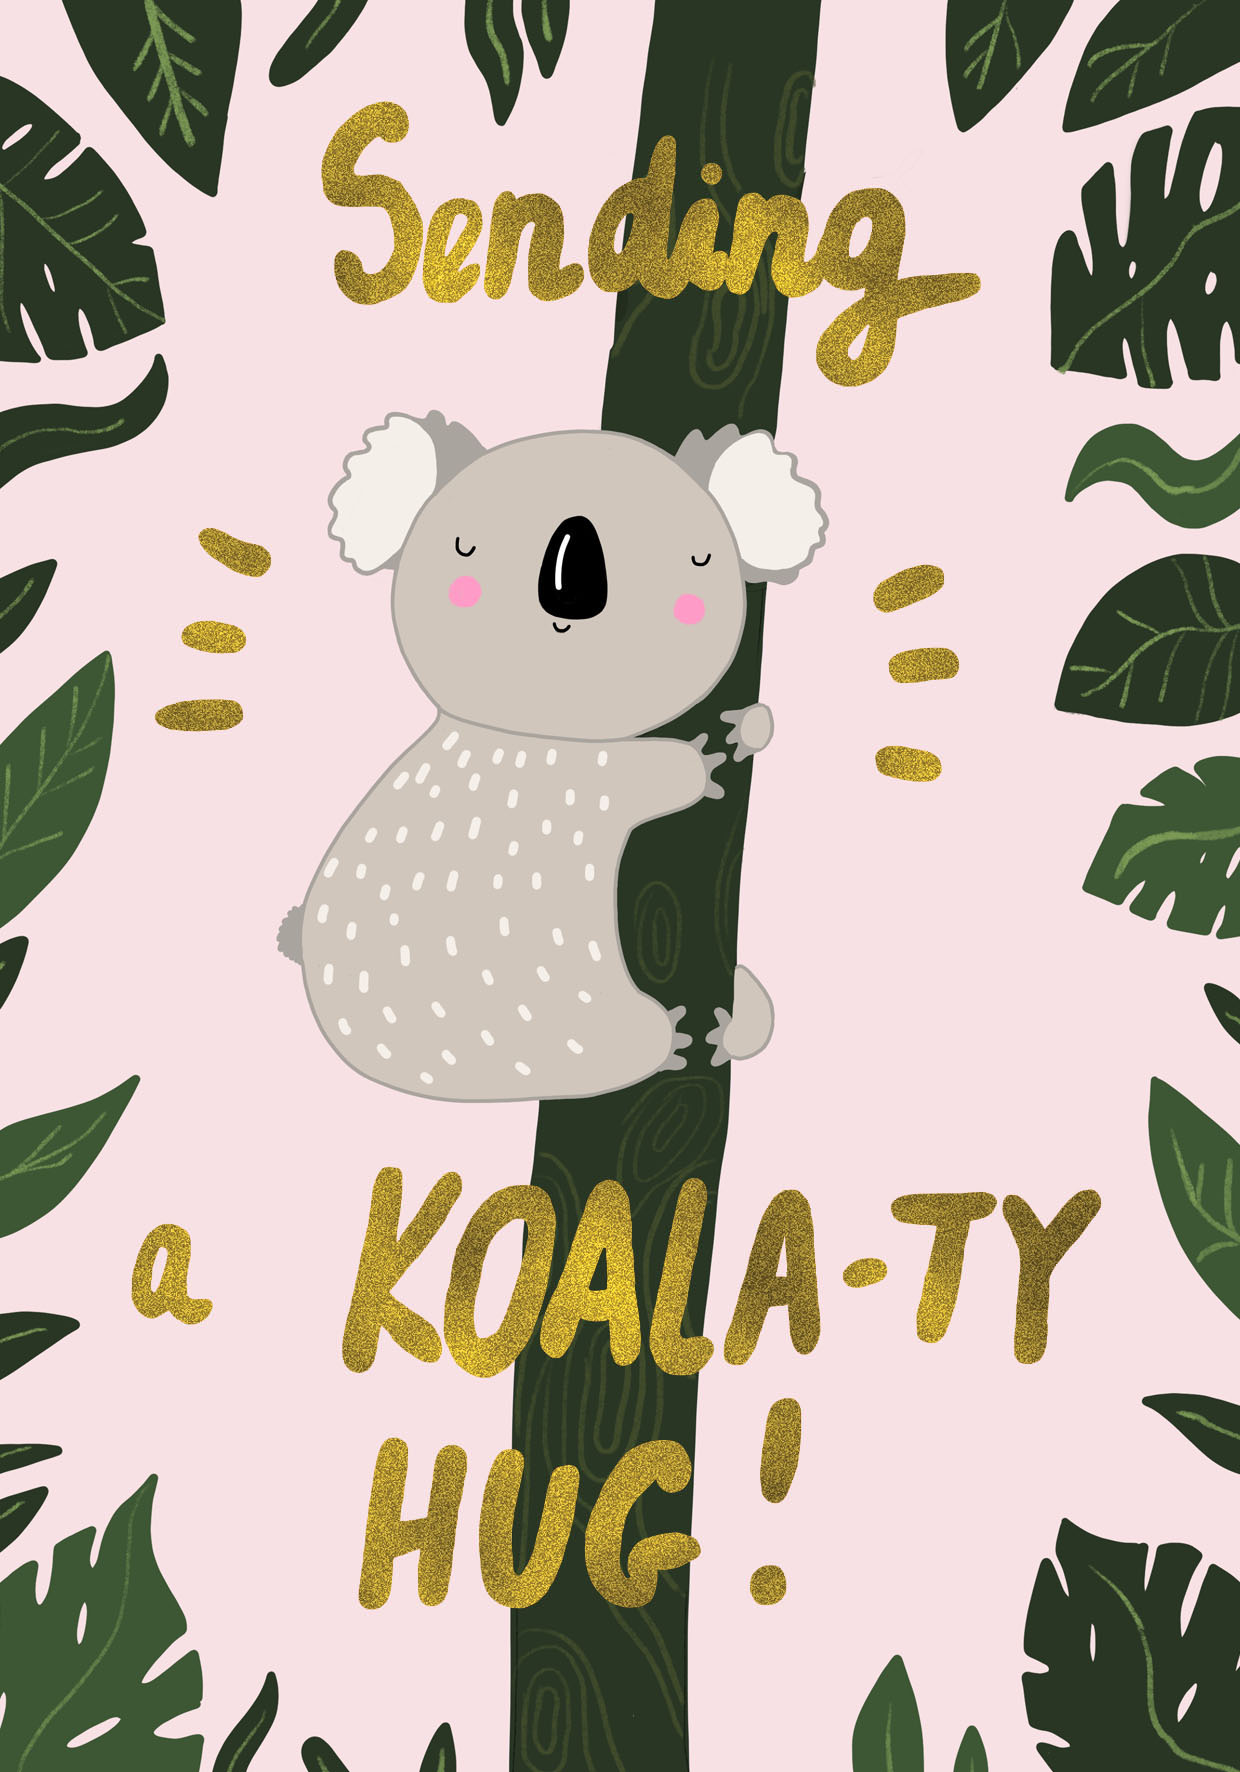 Above: A koala pun on a Forever Funny design.